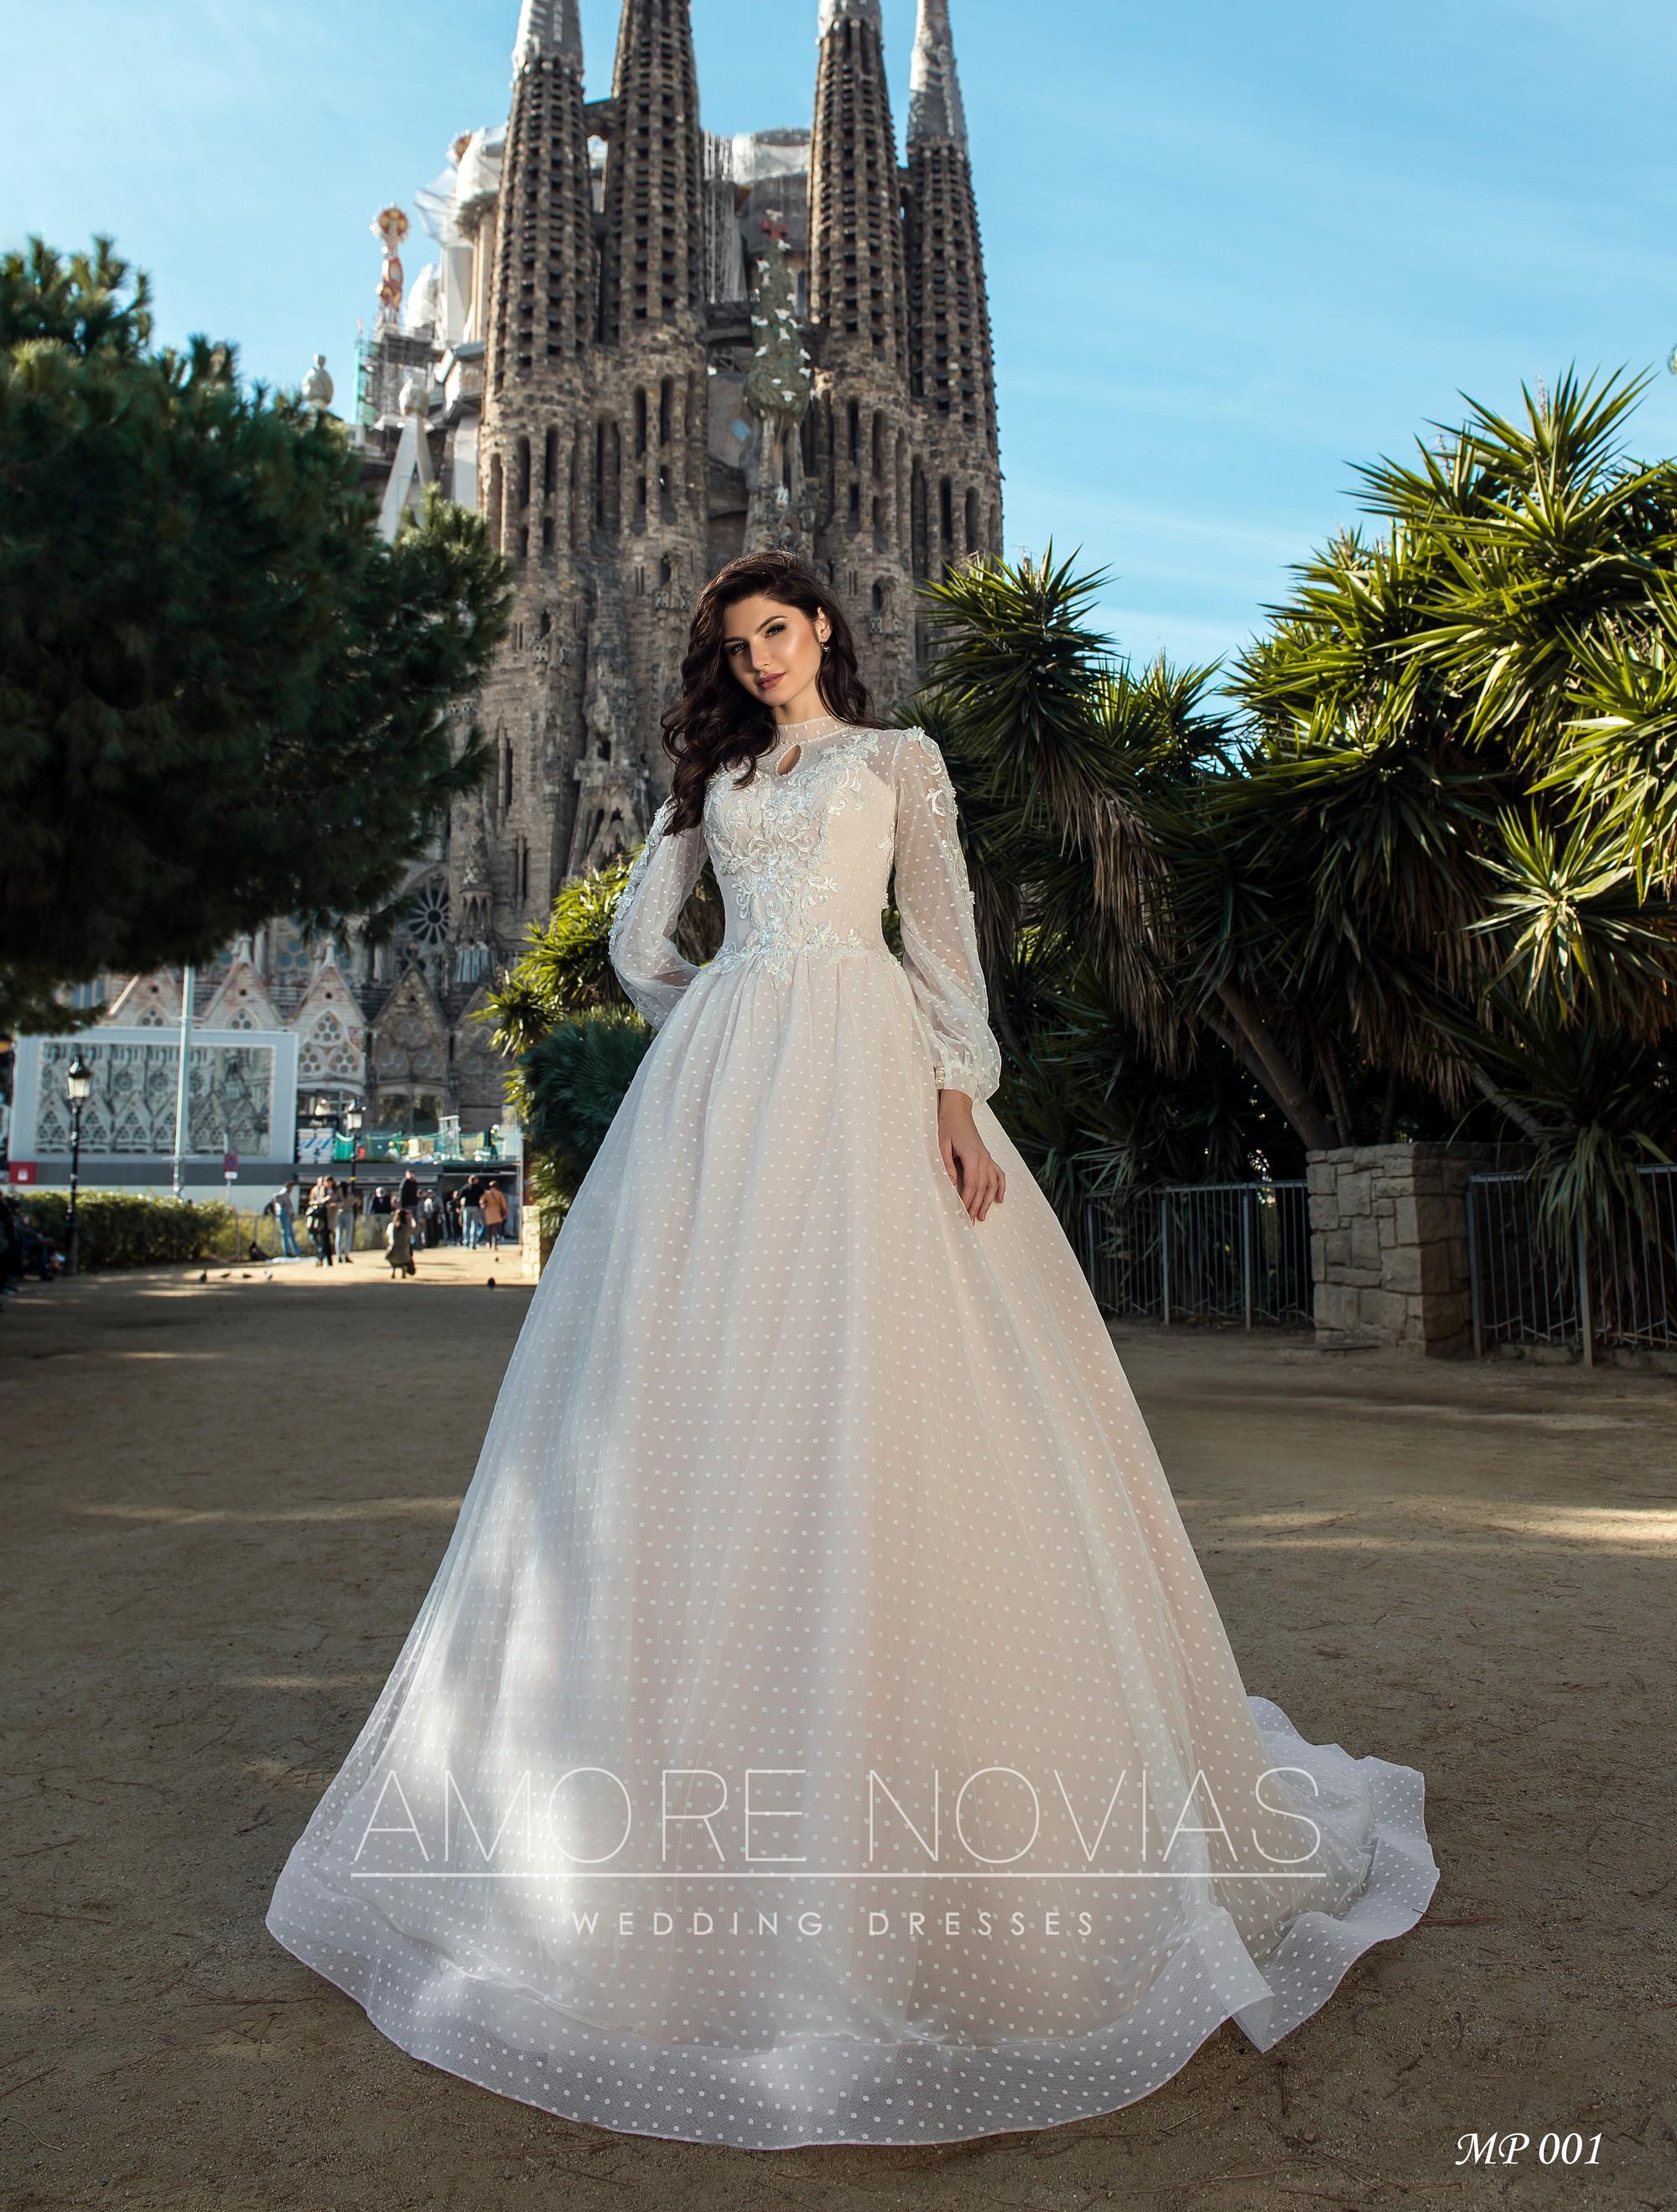 http://amore-novias.com/images/stories/virtuemart/product/mp-001-------(1).jpg